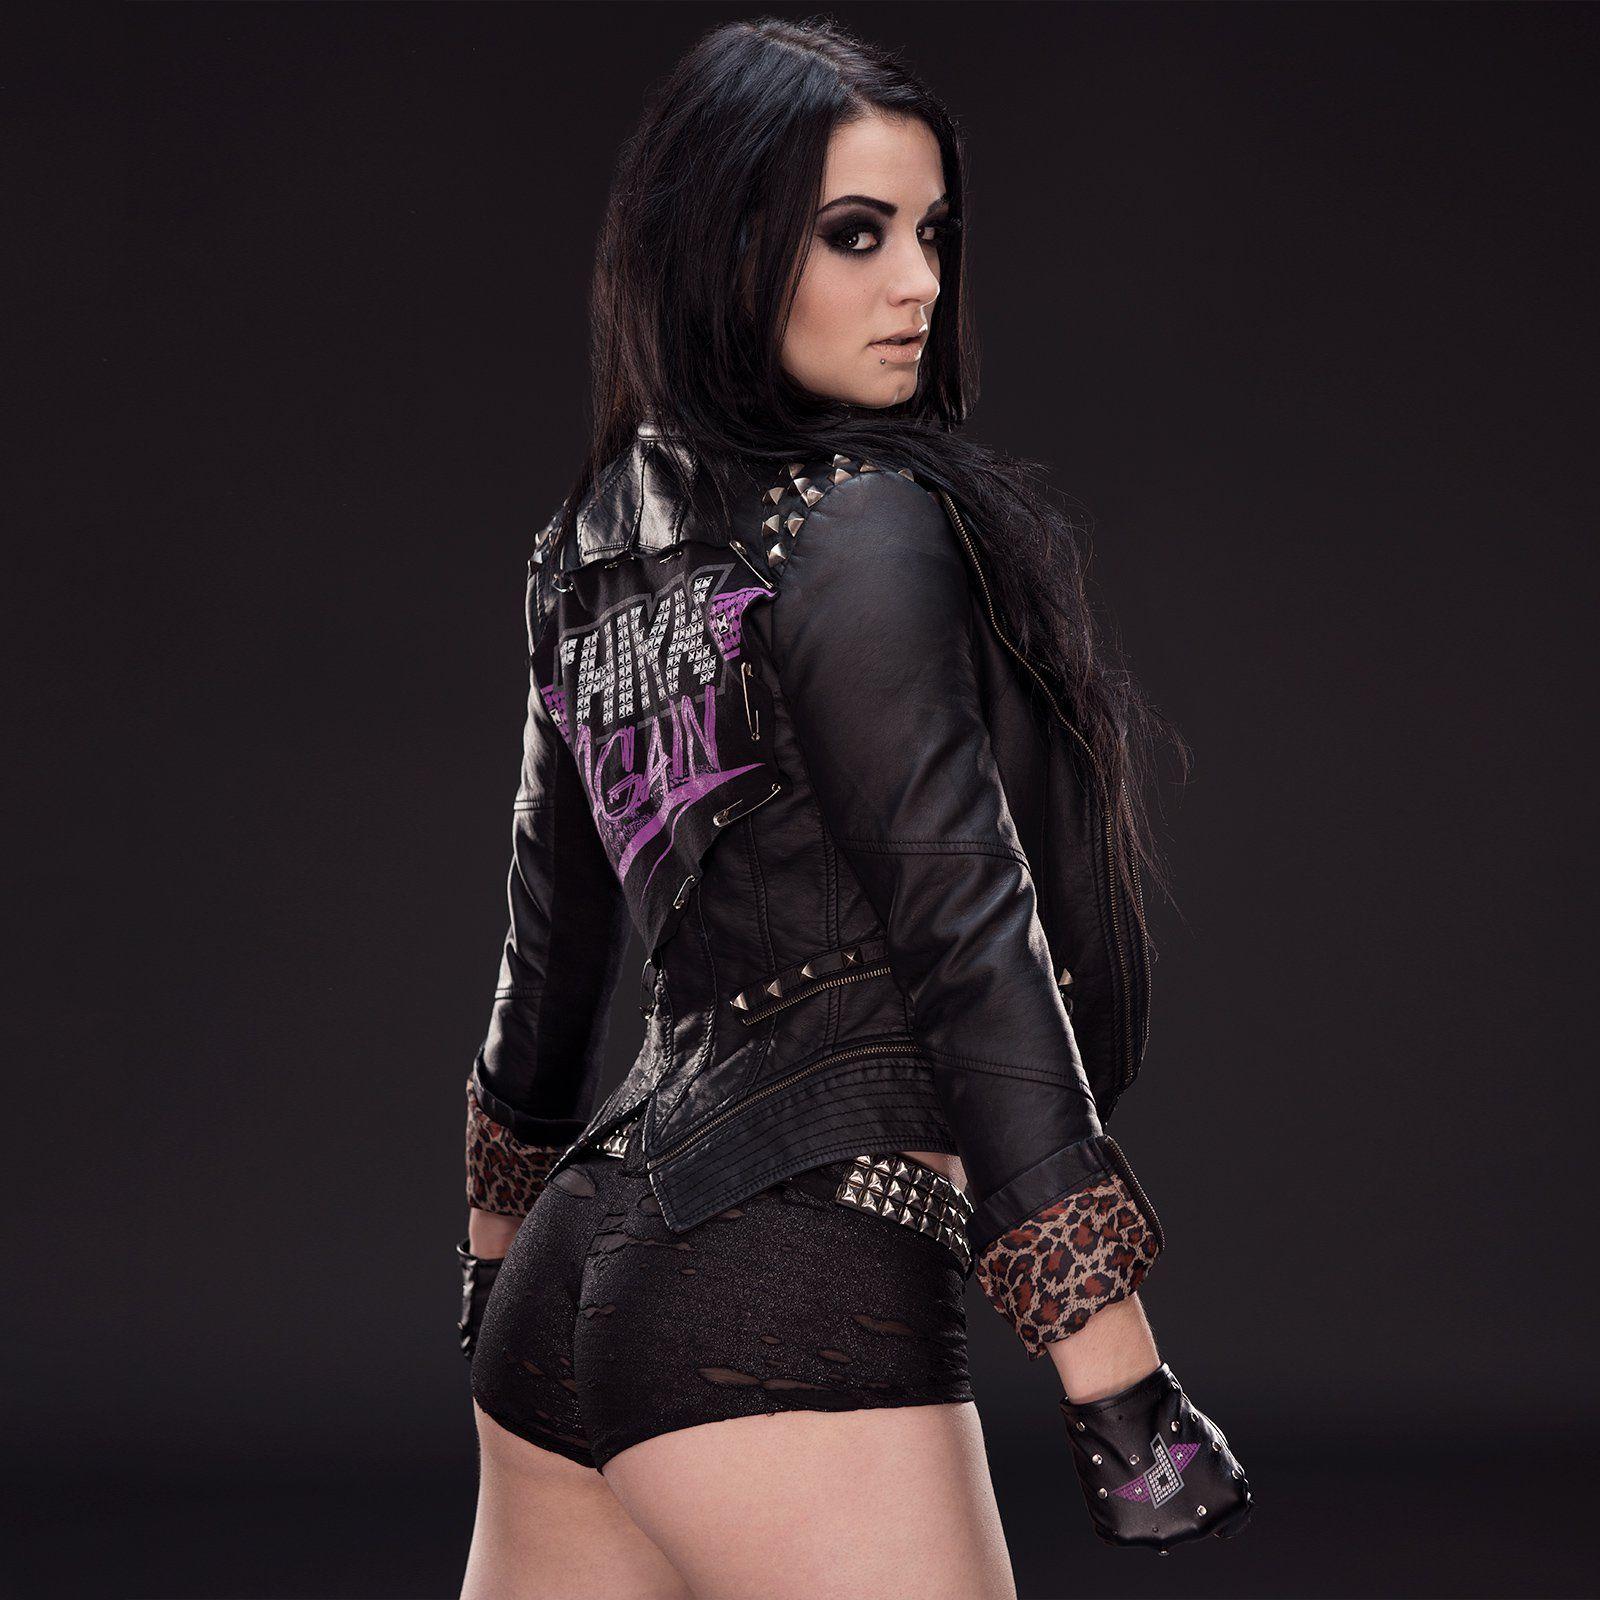 Paige WWE Nude Photos 94